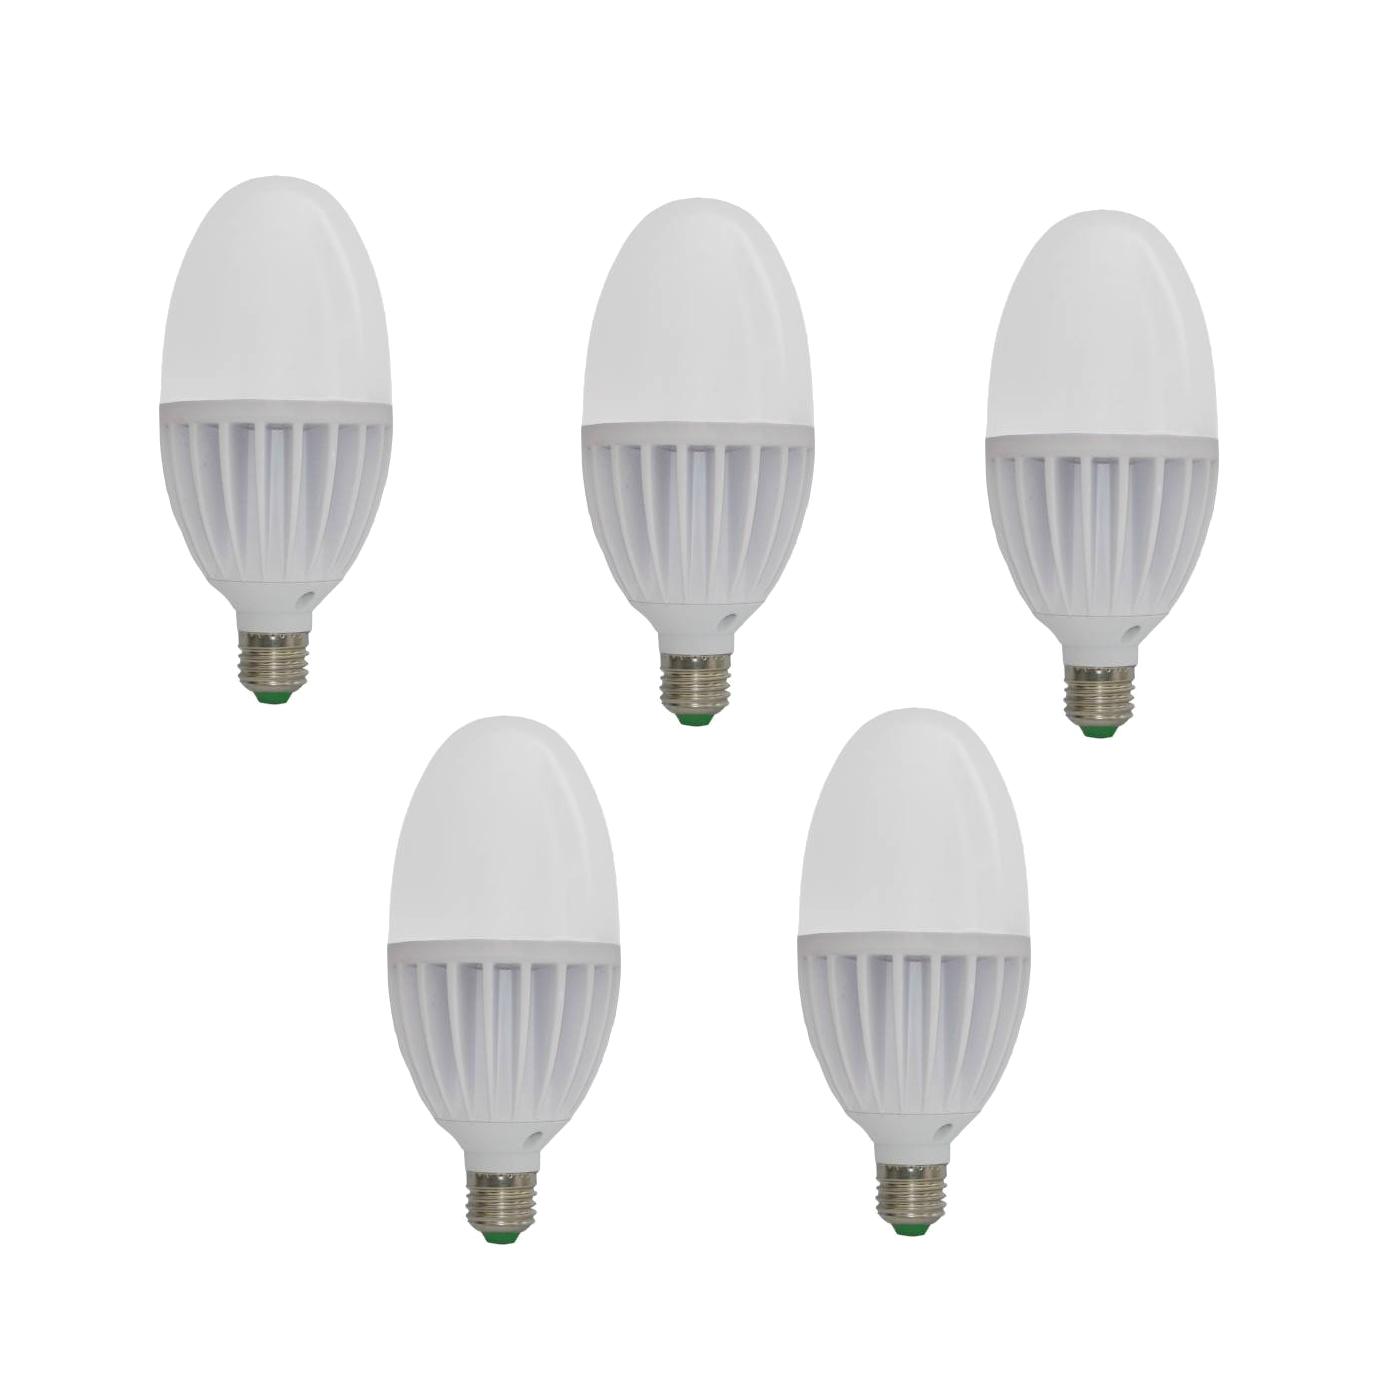 لامپ ال ای دی 5 وات نامین نور سرپیچ E14 مدل NL624C بسته ی 5 عددی